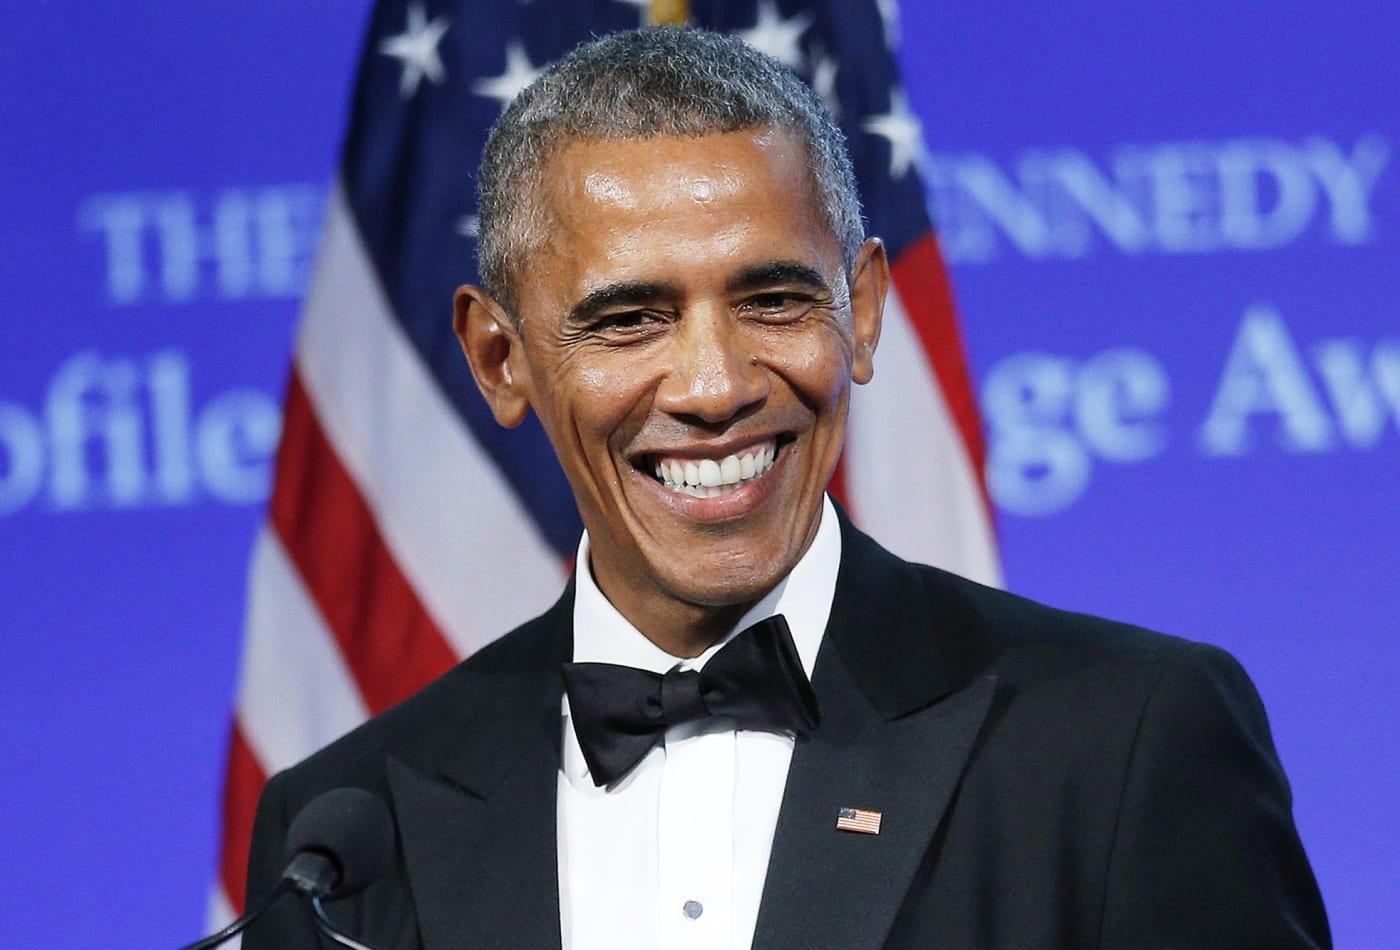 President Barack Obama Sends A Heartfelt Message To The World